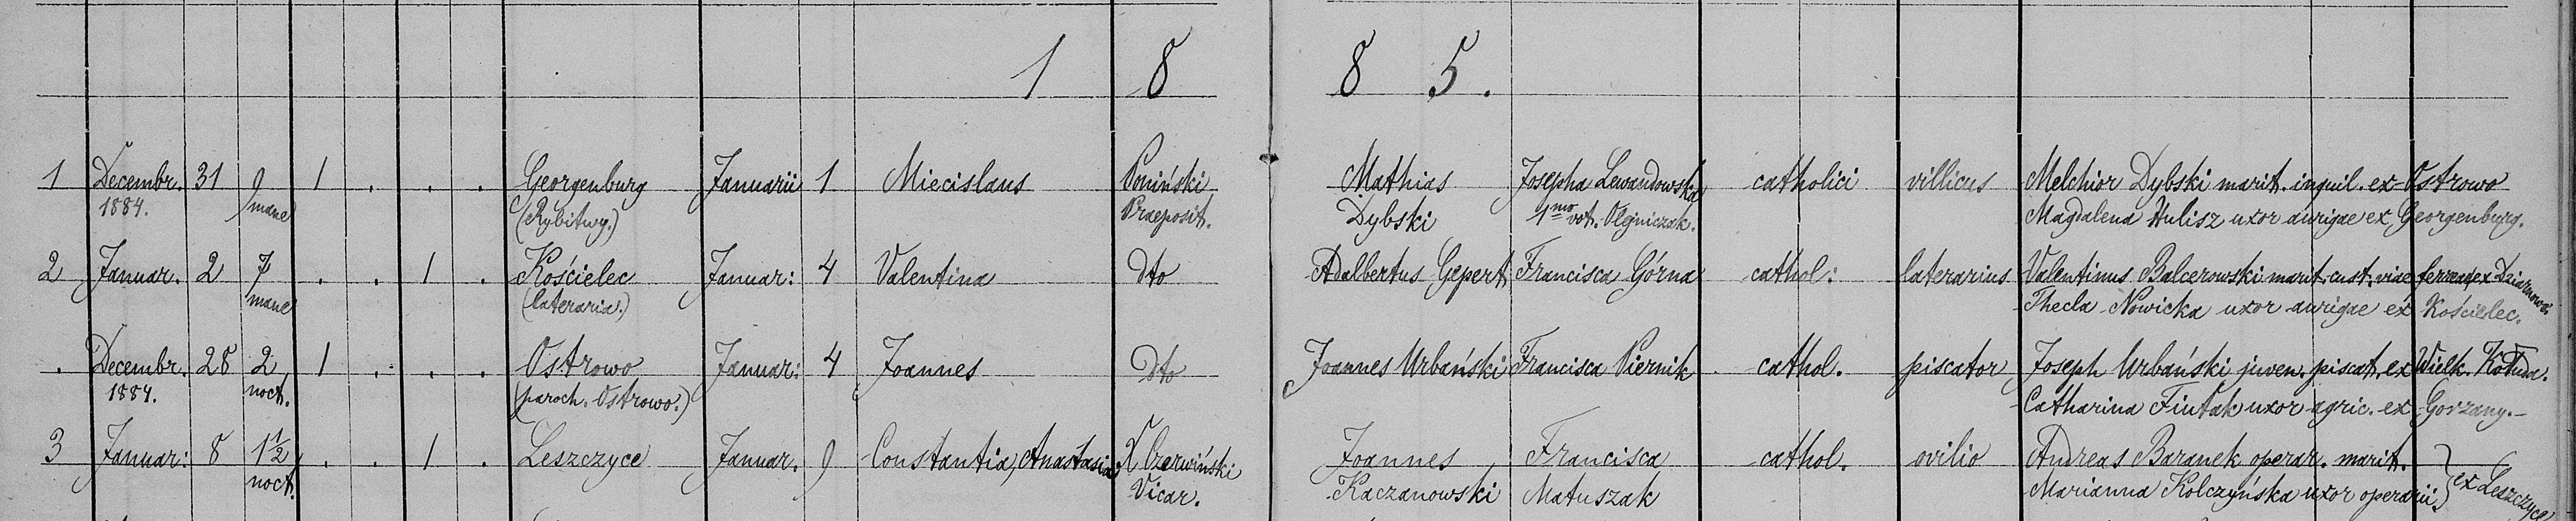 1885 Kaczanowska baptisms